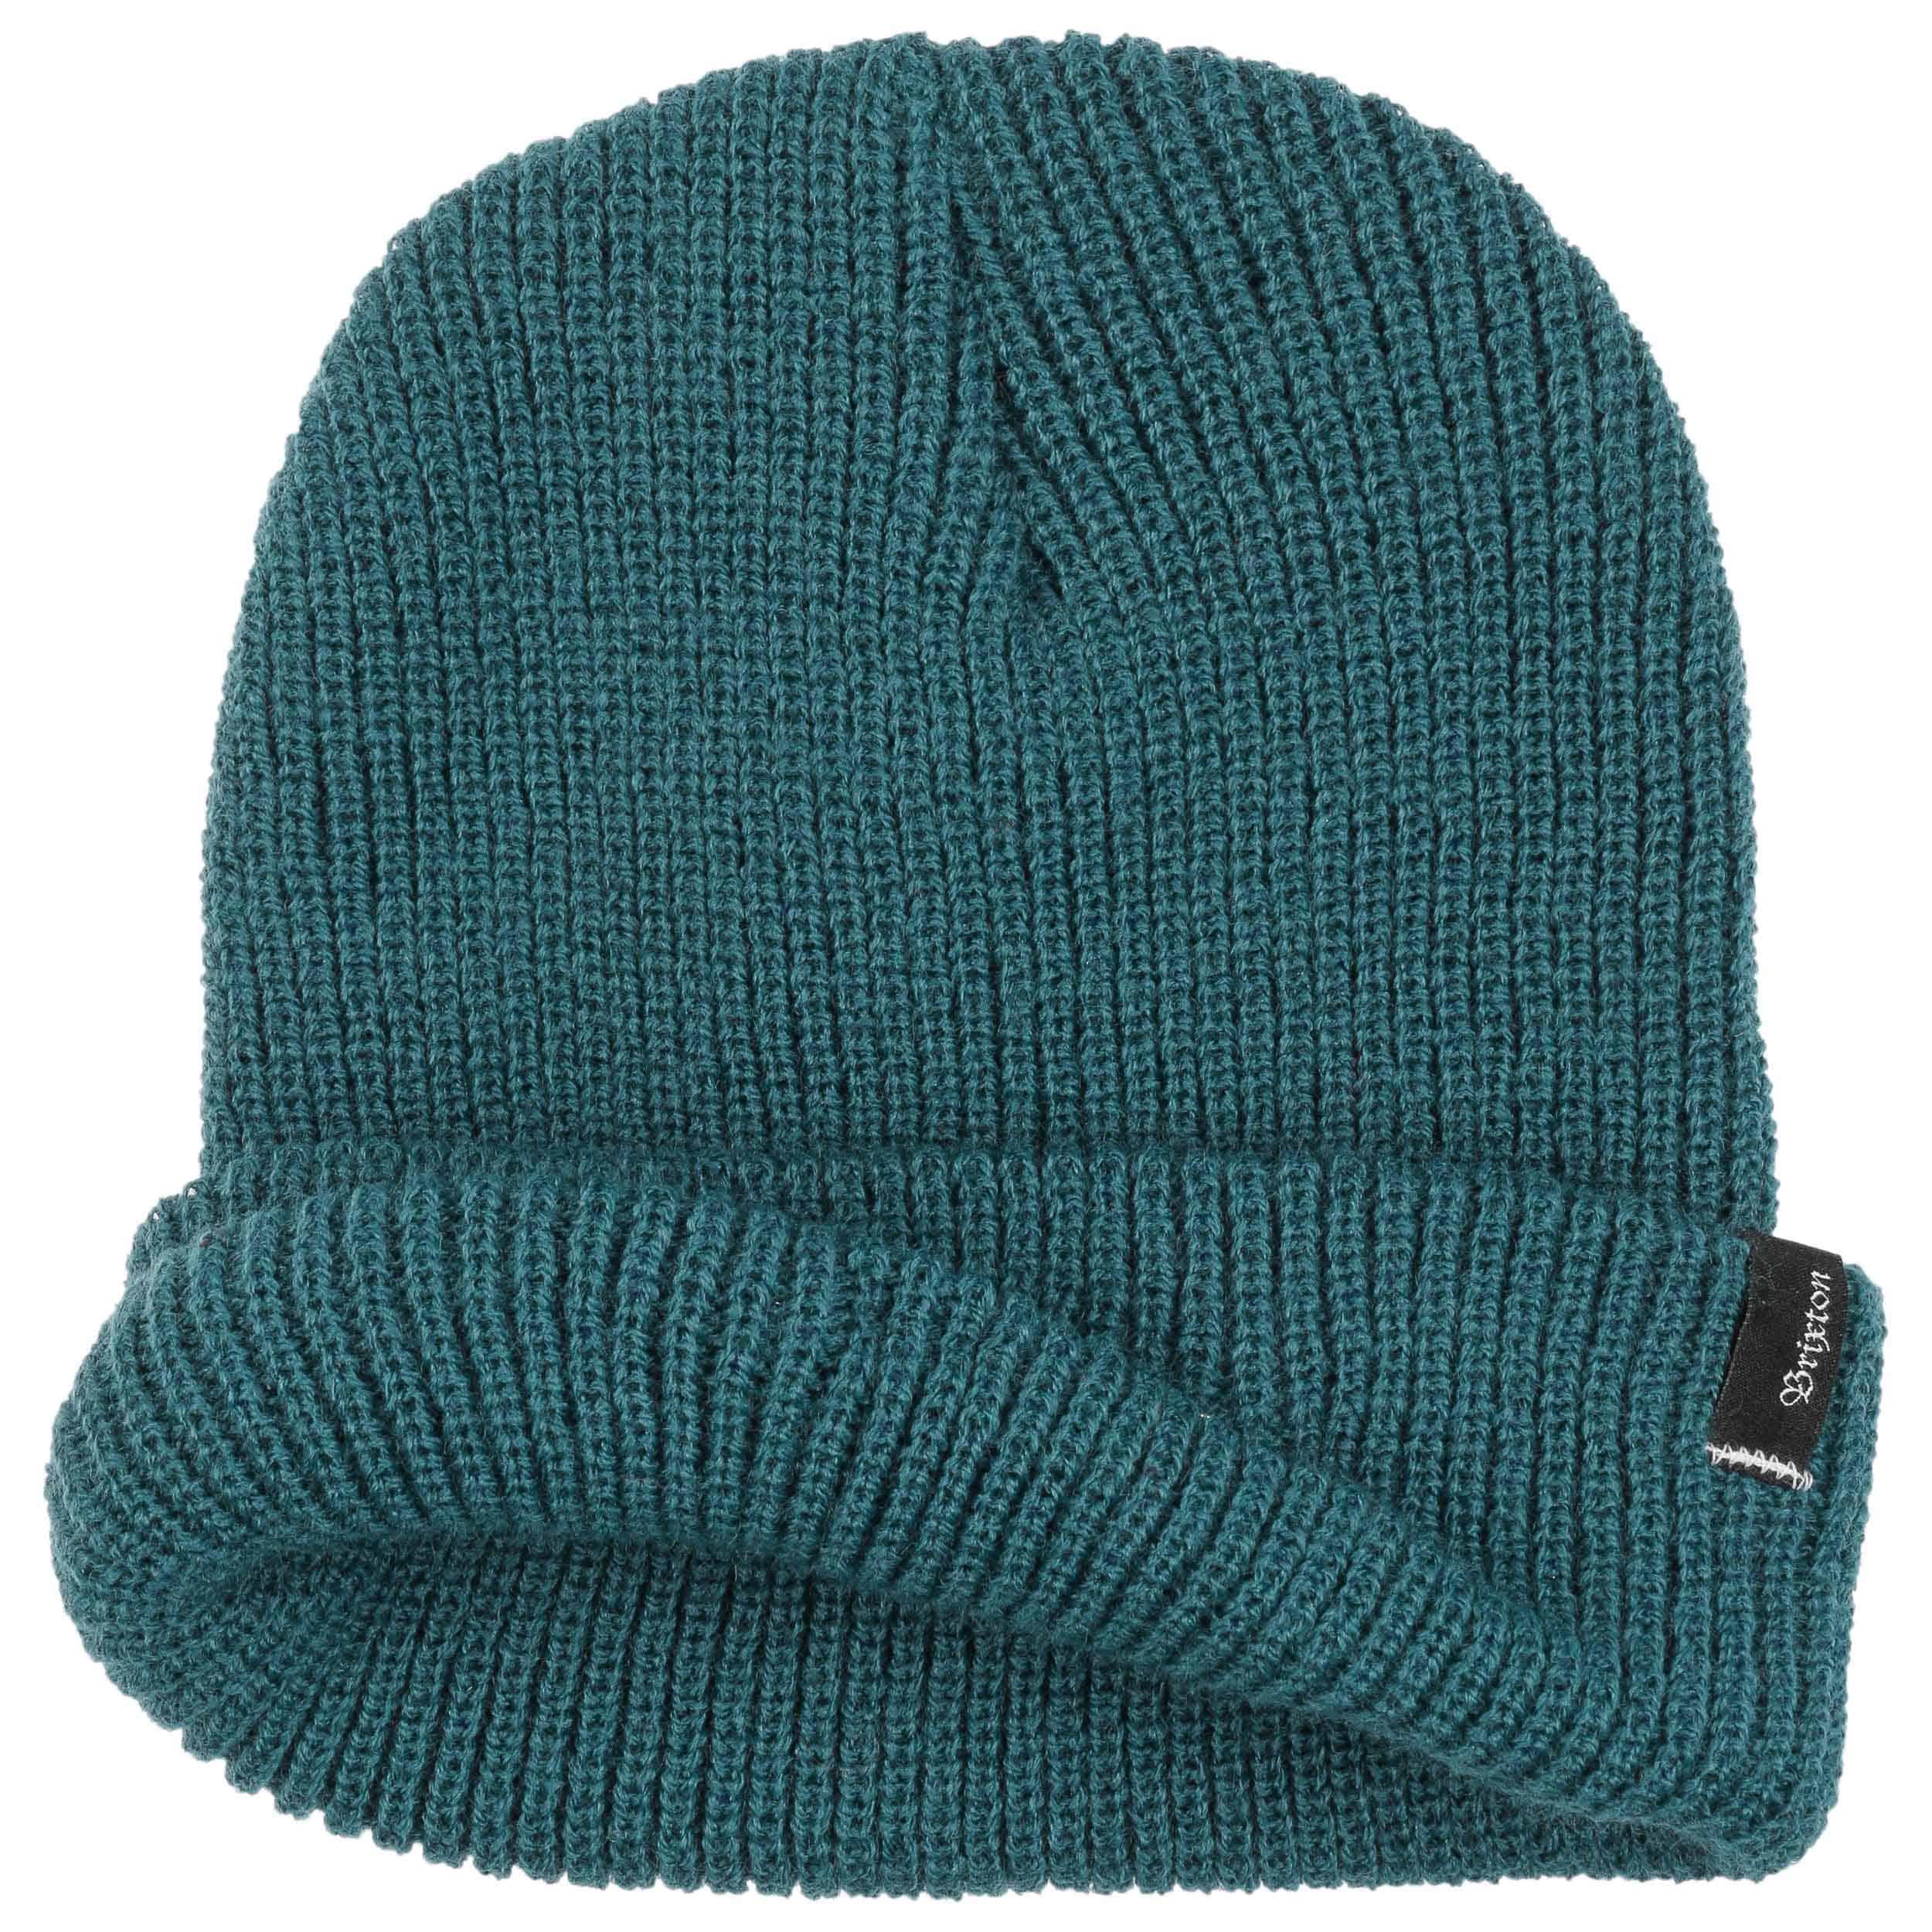 56aa57d4 ... discount aspen beanie hat by brixton petrol blue 1 82c06 e1823